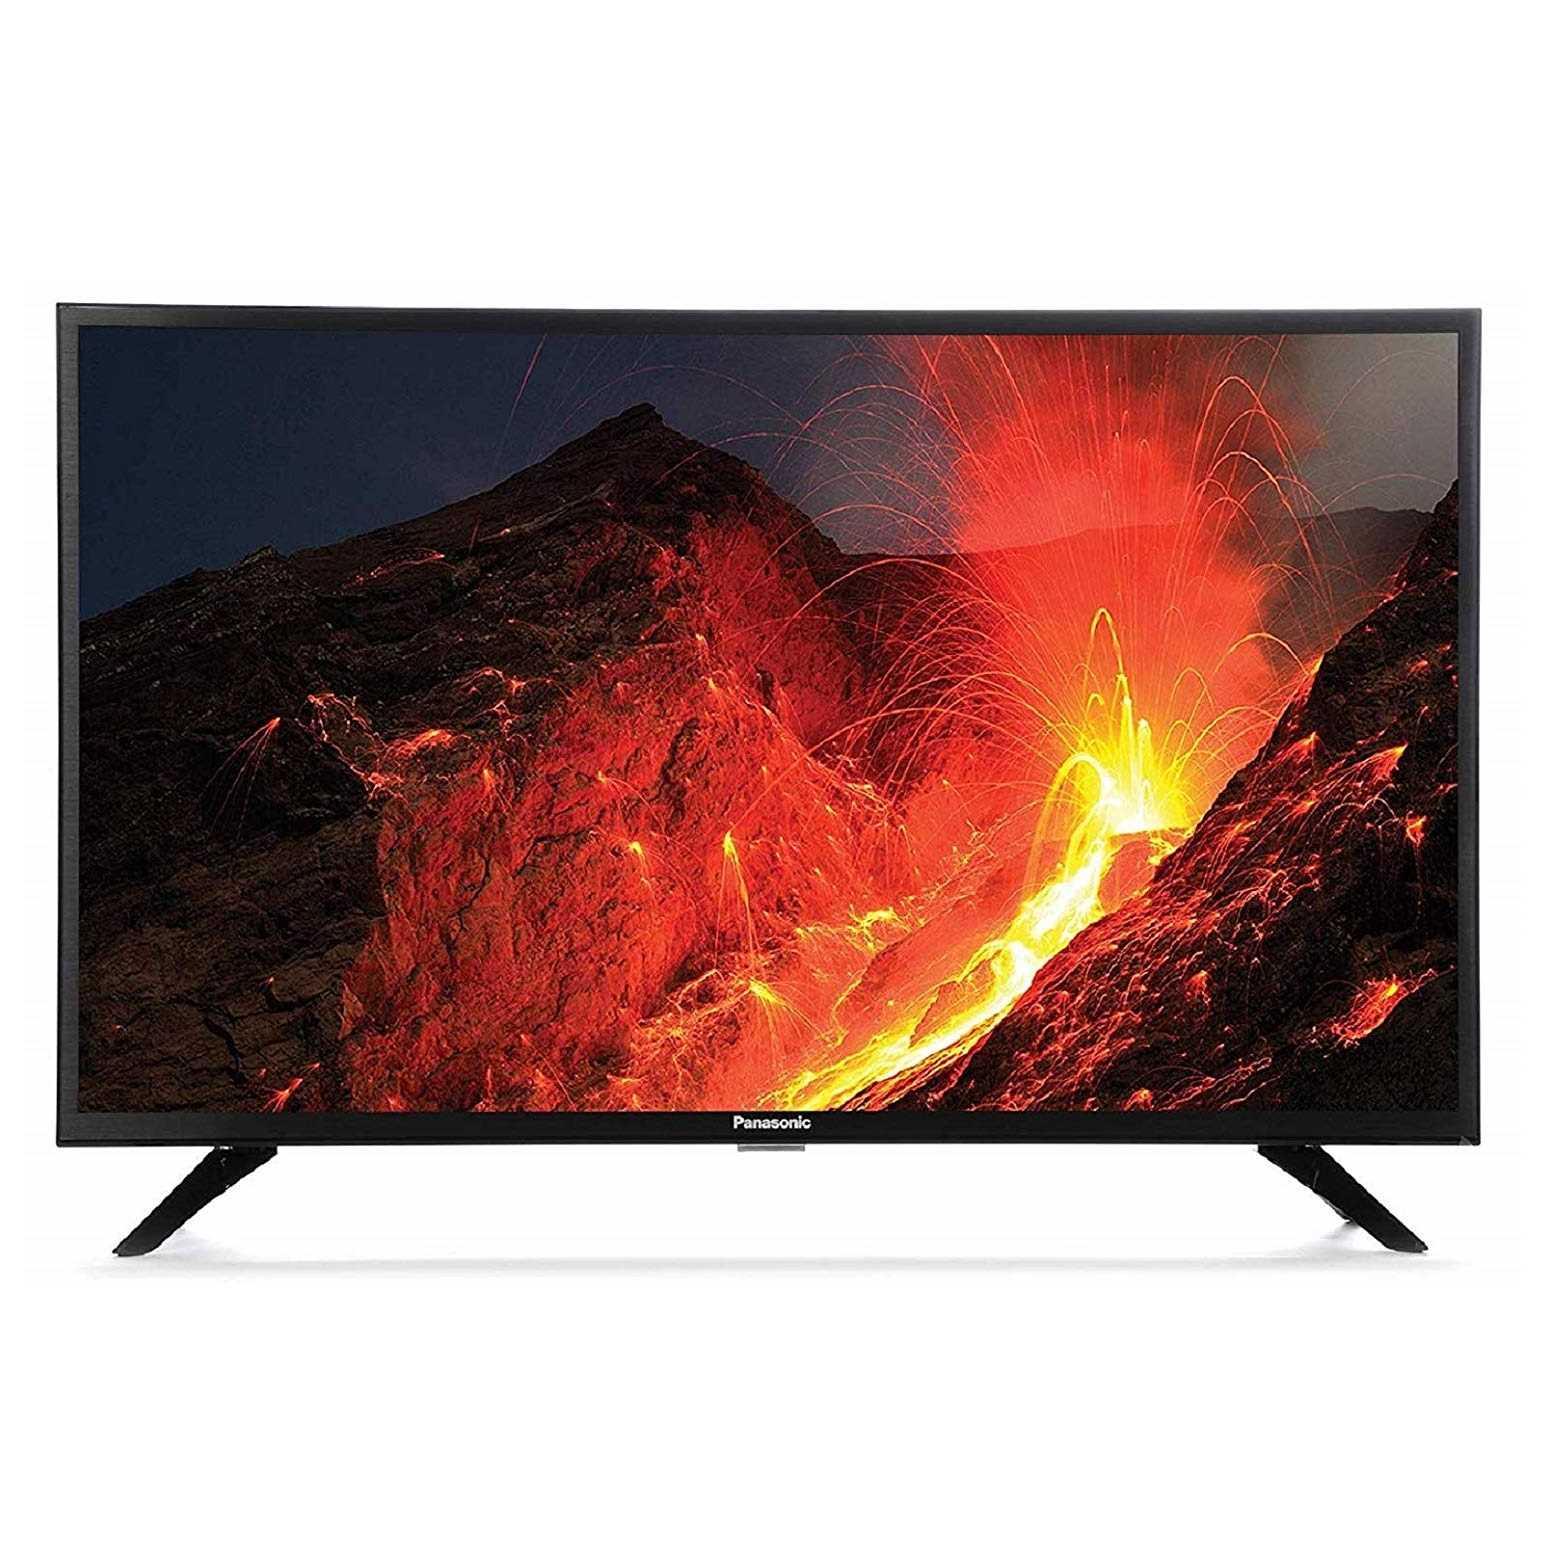 Panasonic TH-32F204DX 32 Inch HD Ready LED Television